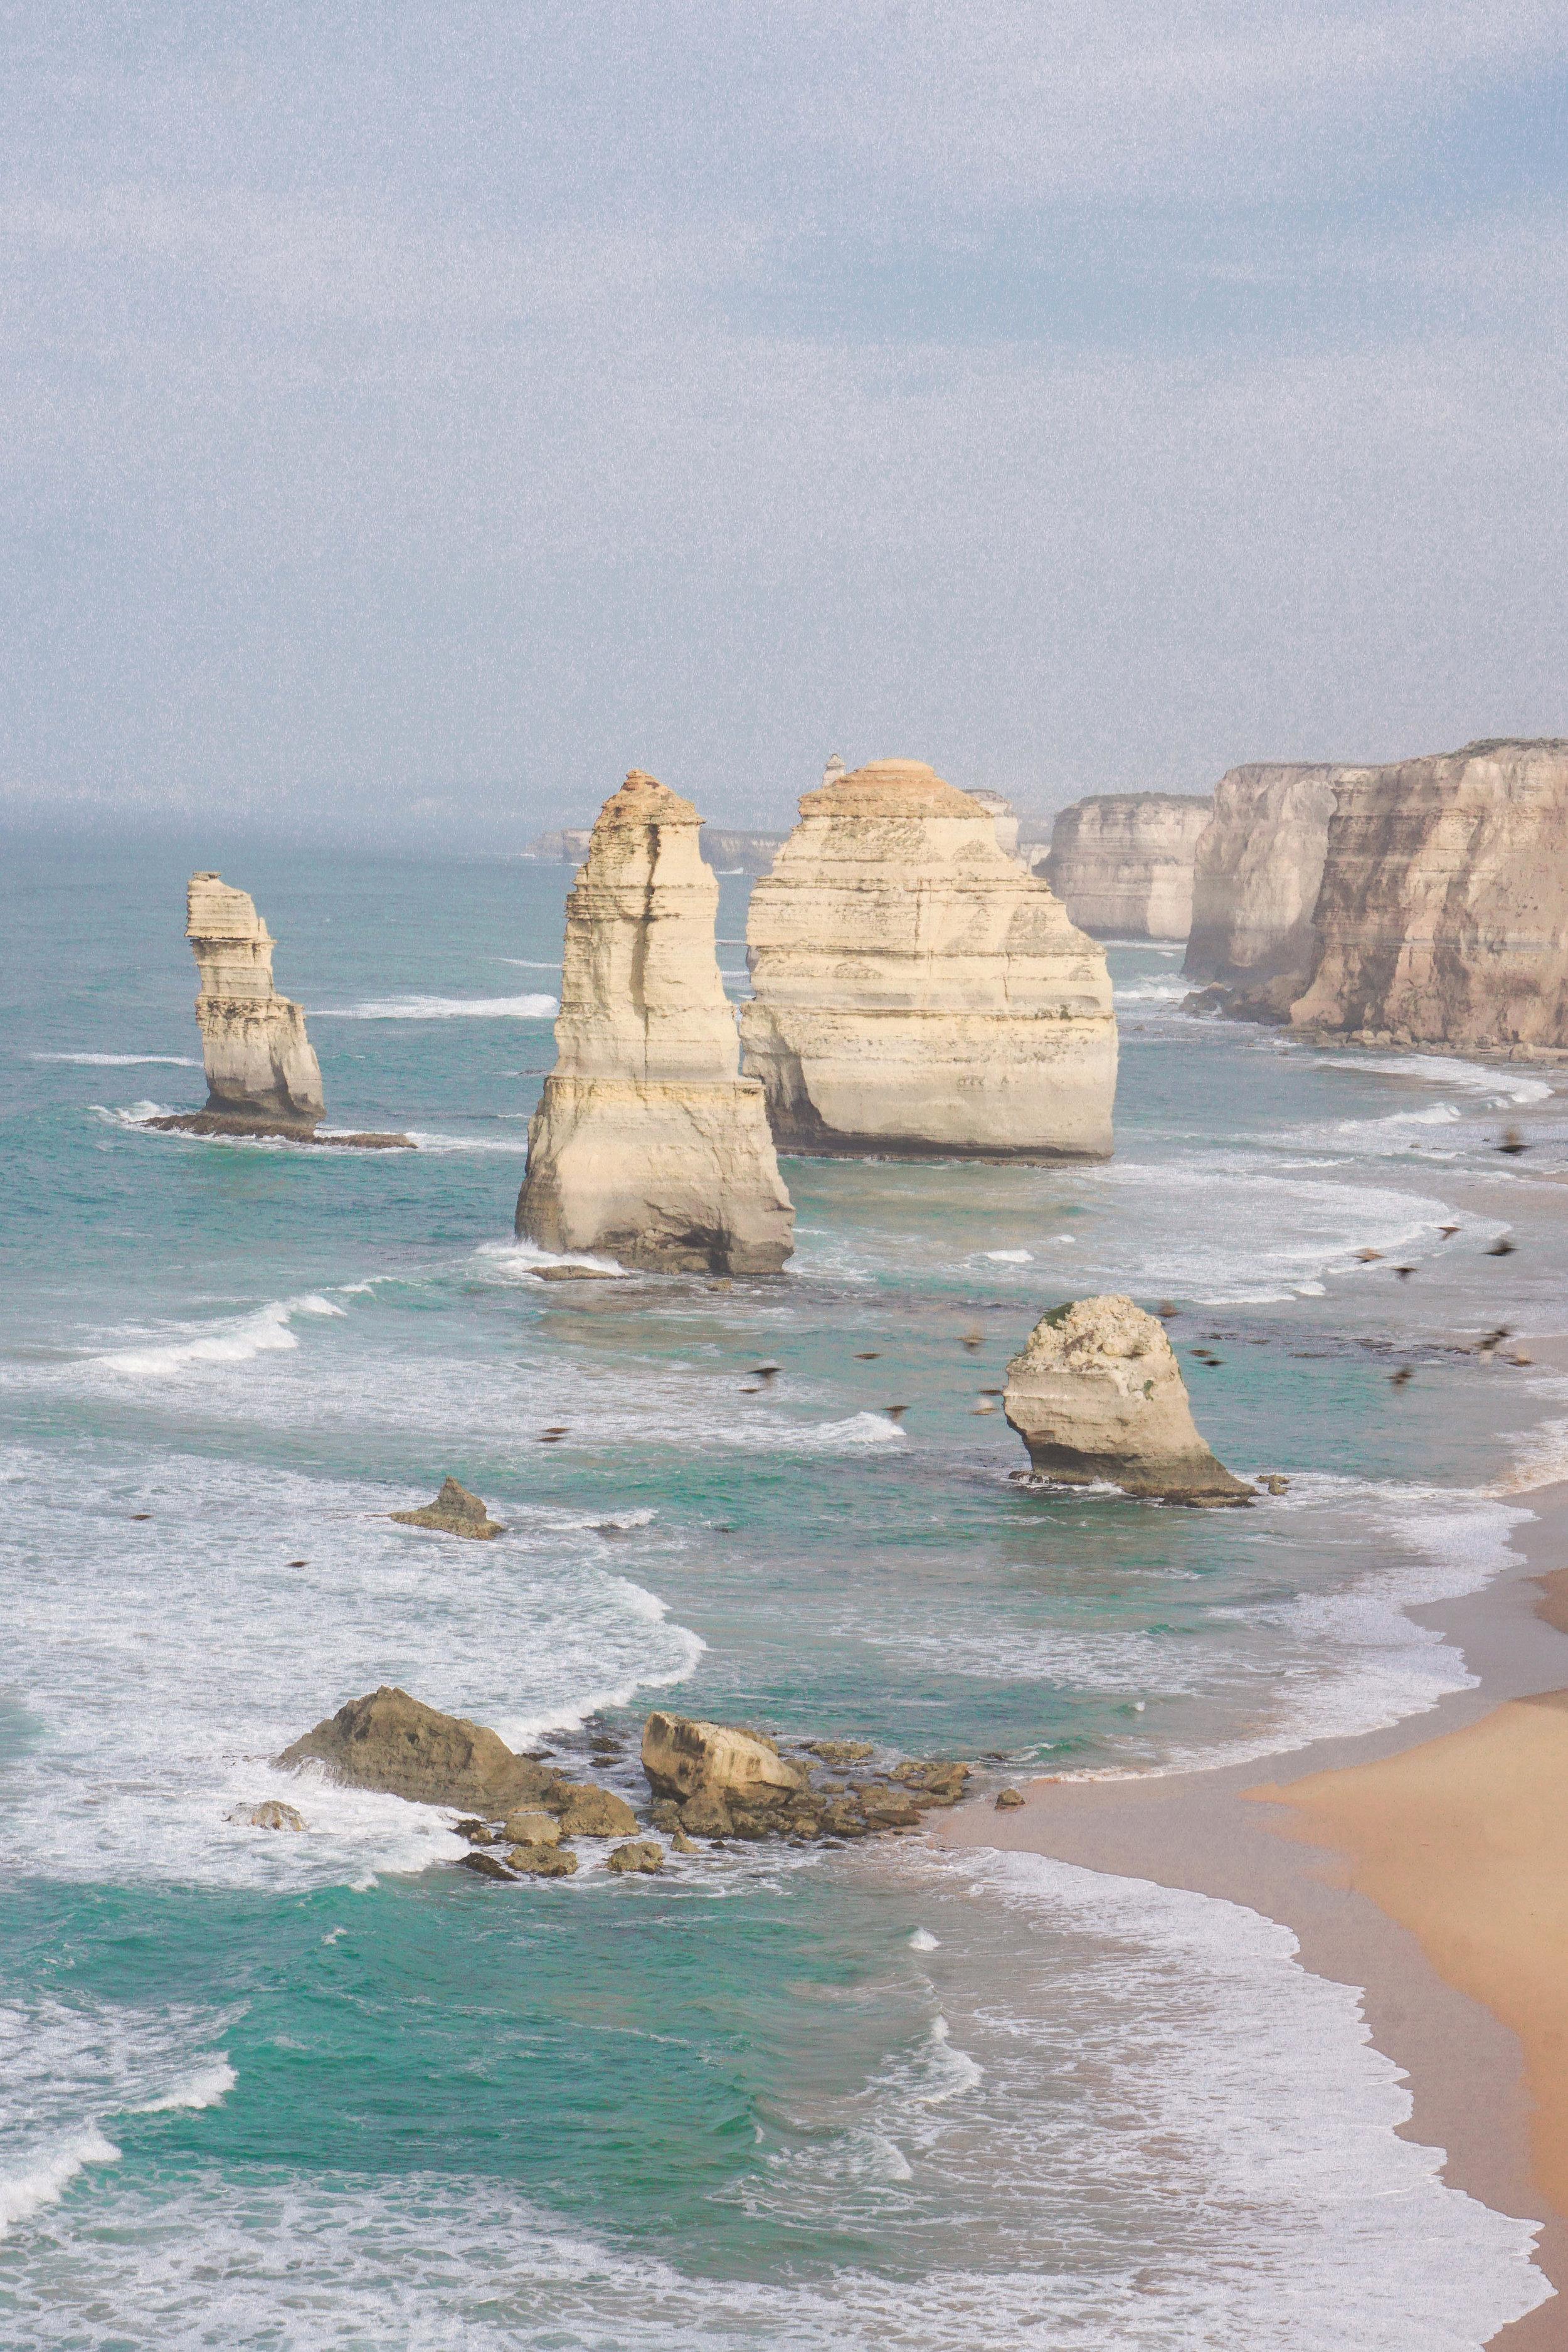 Australia - Great Ocean Road - Twelve Apostles